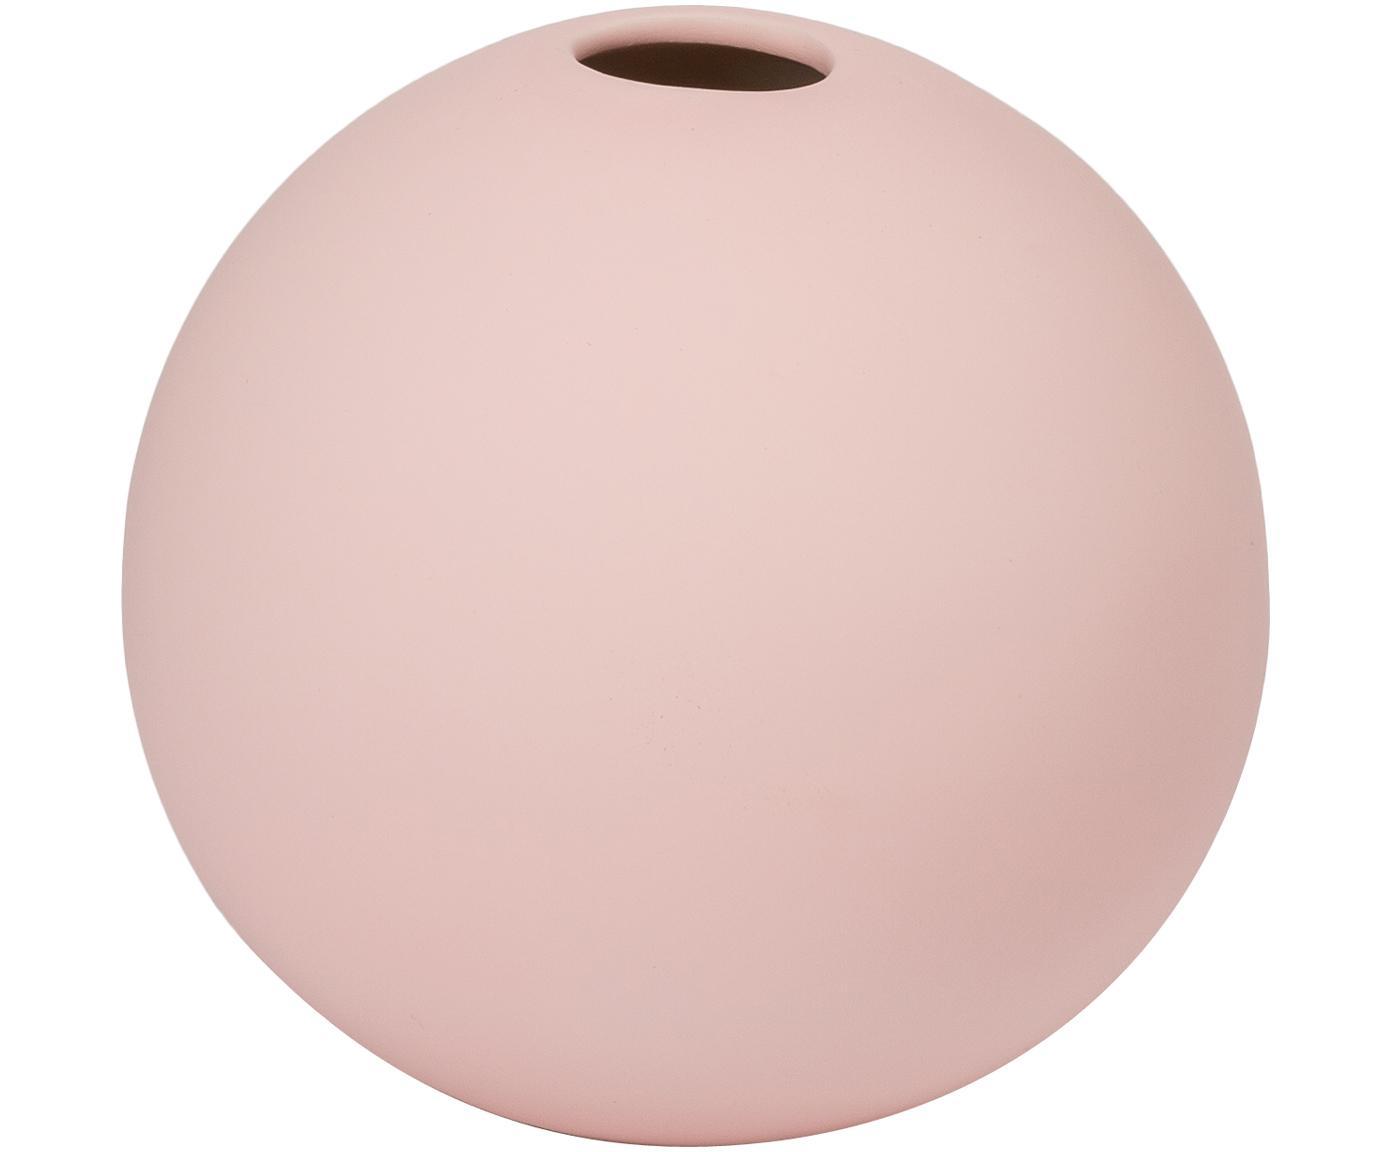 Handgemaakte bollen vaas Ball, Keramiek, Roze, Ø 8 x H 8 cm